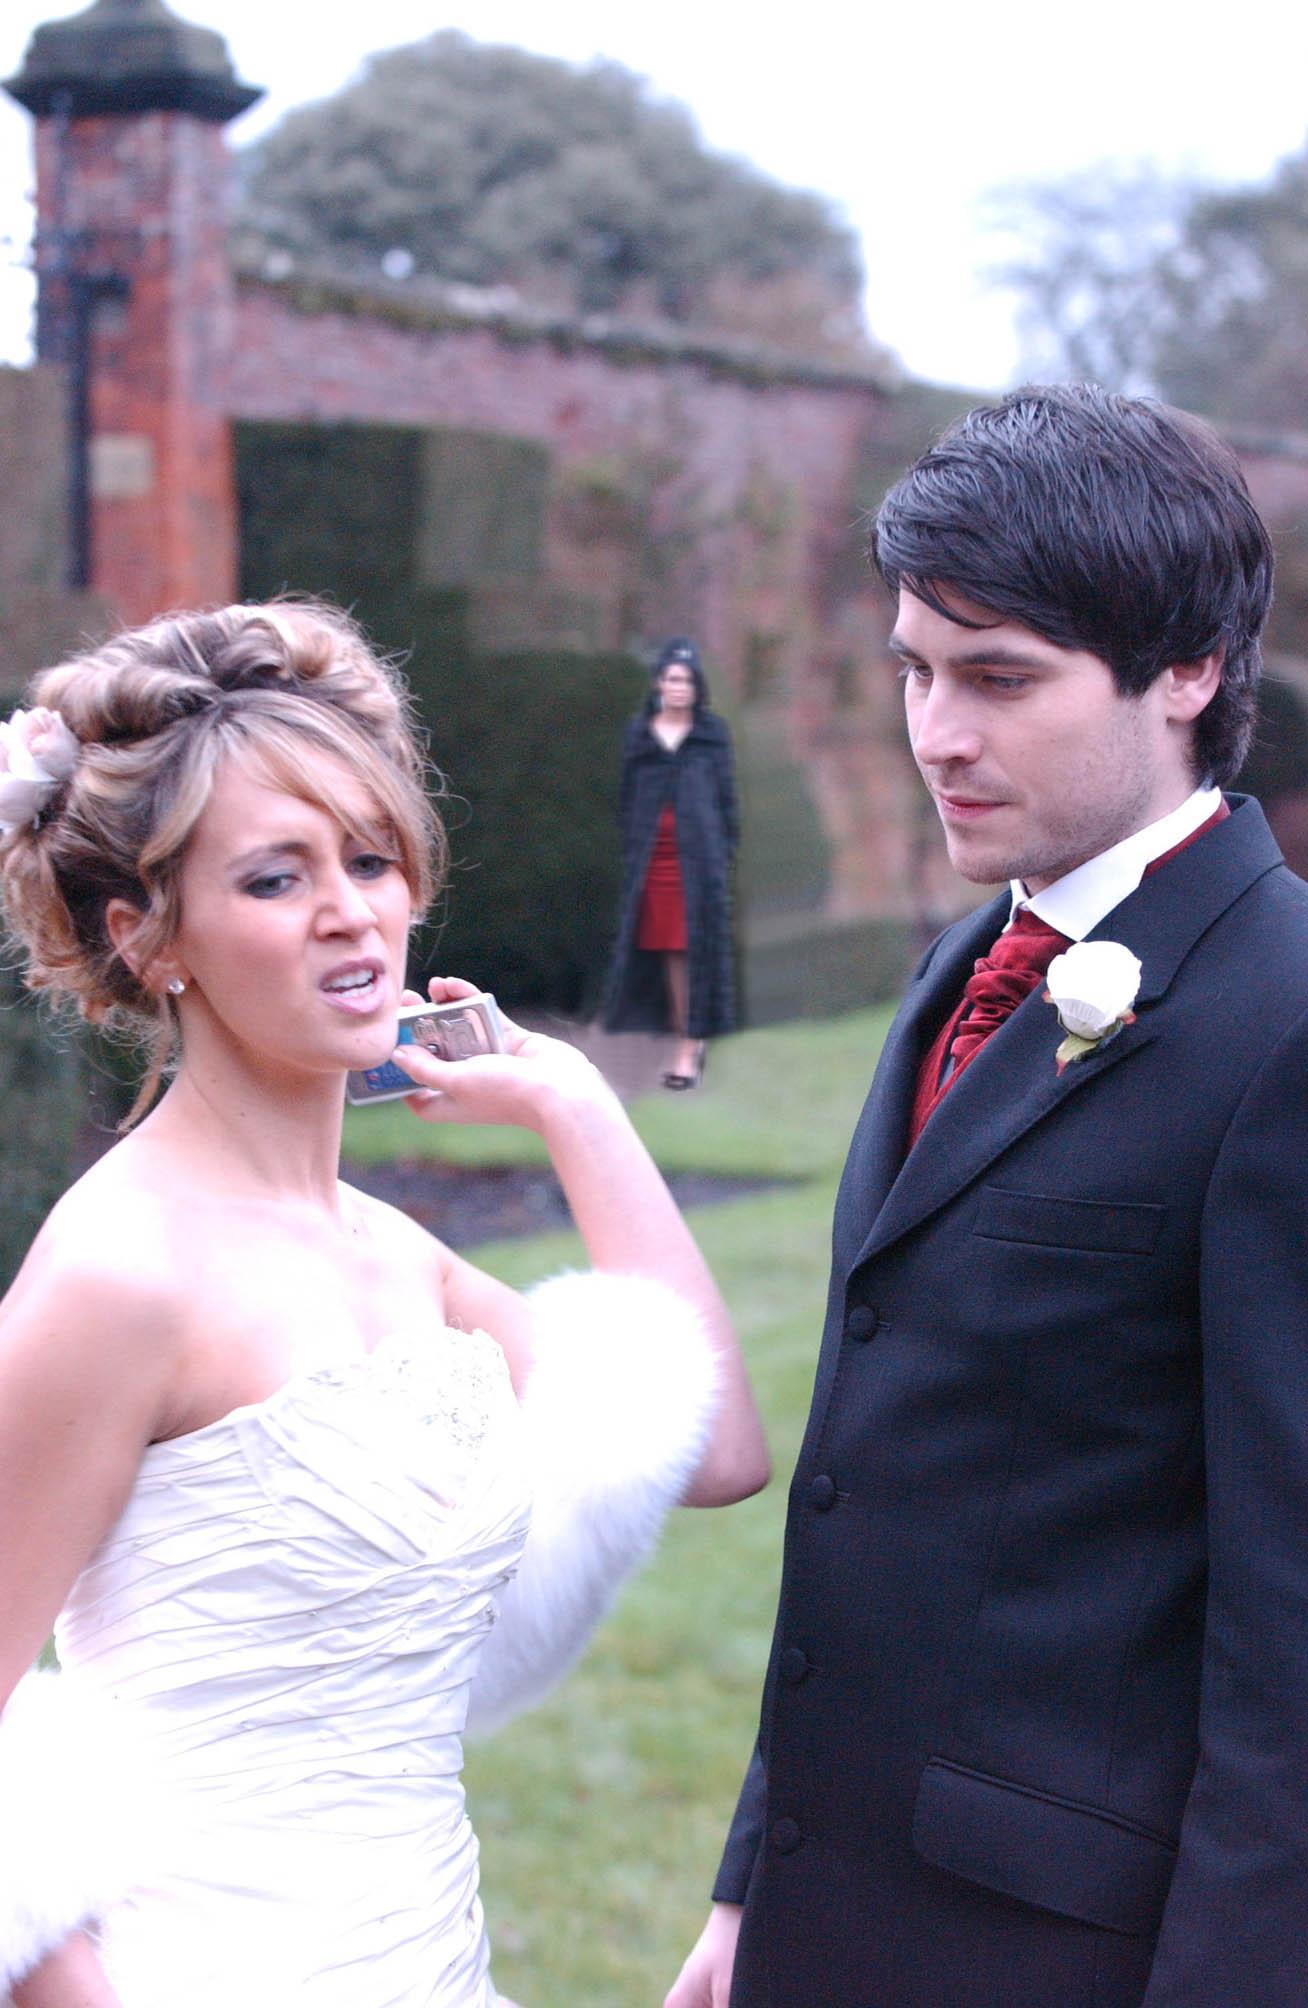 Has Carla ruined the wedding?